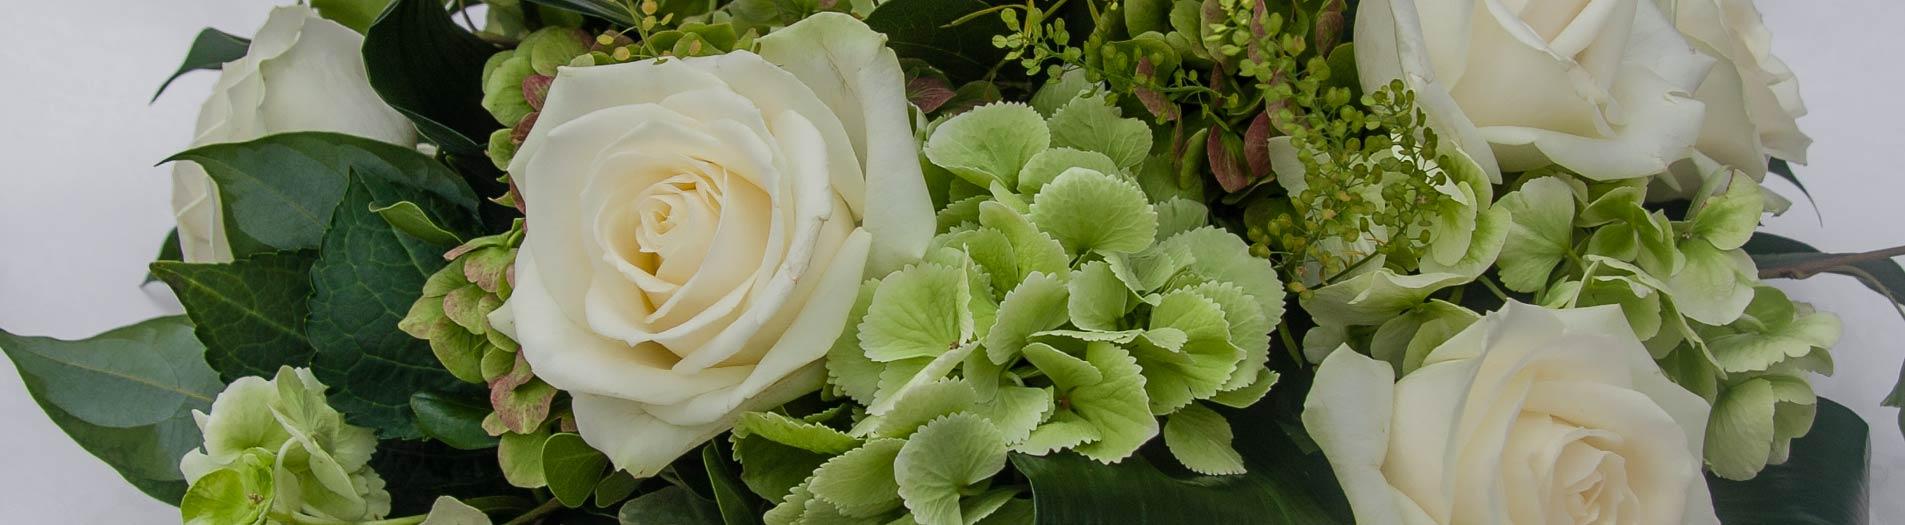 Matrimonio Tema Ortensie : Abbobbi floreali centrotavola e bouquet a tema bianco verde